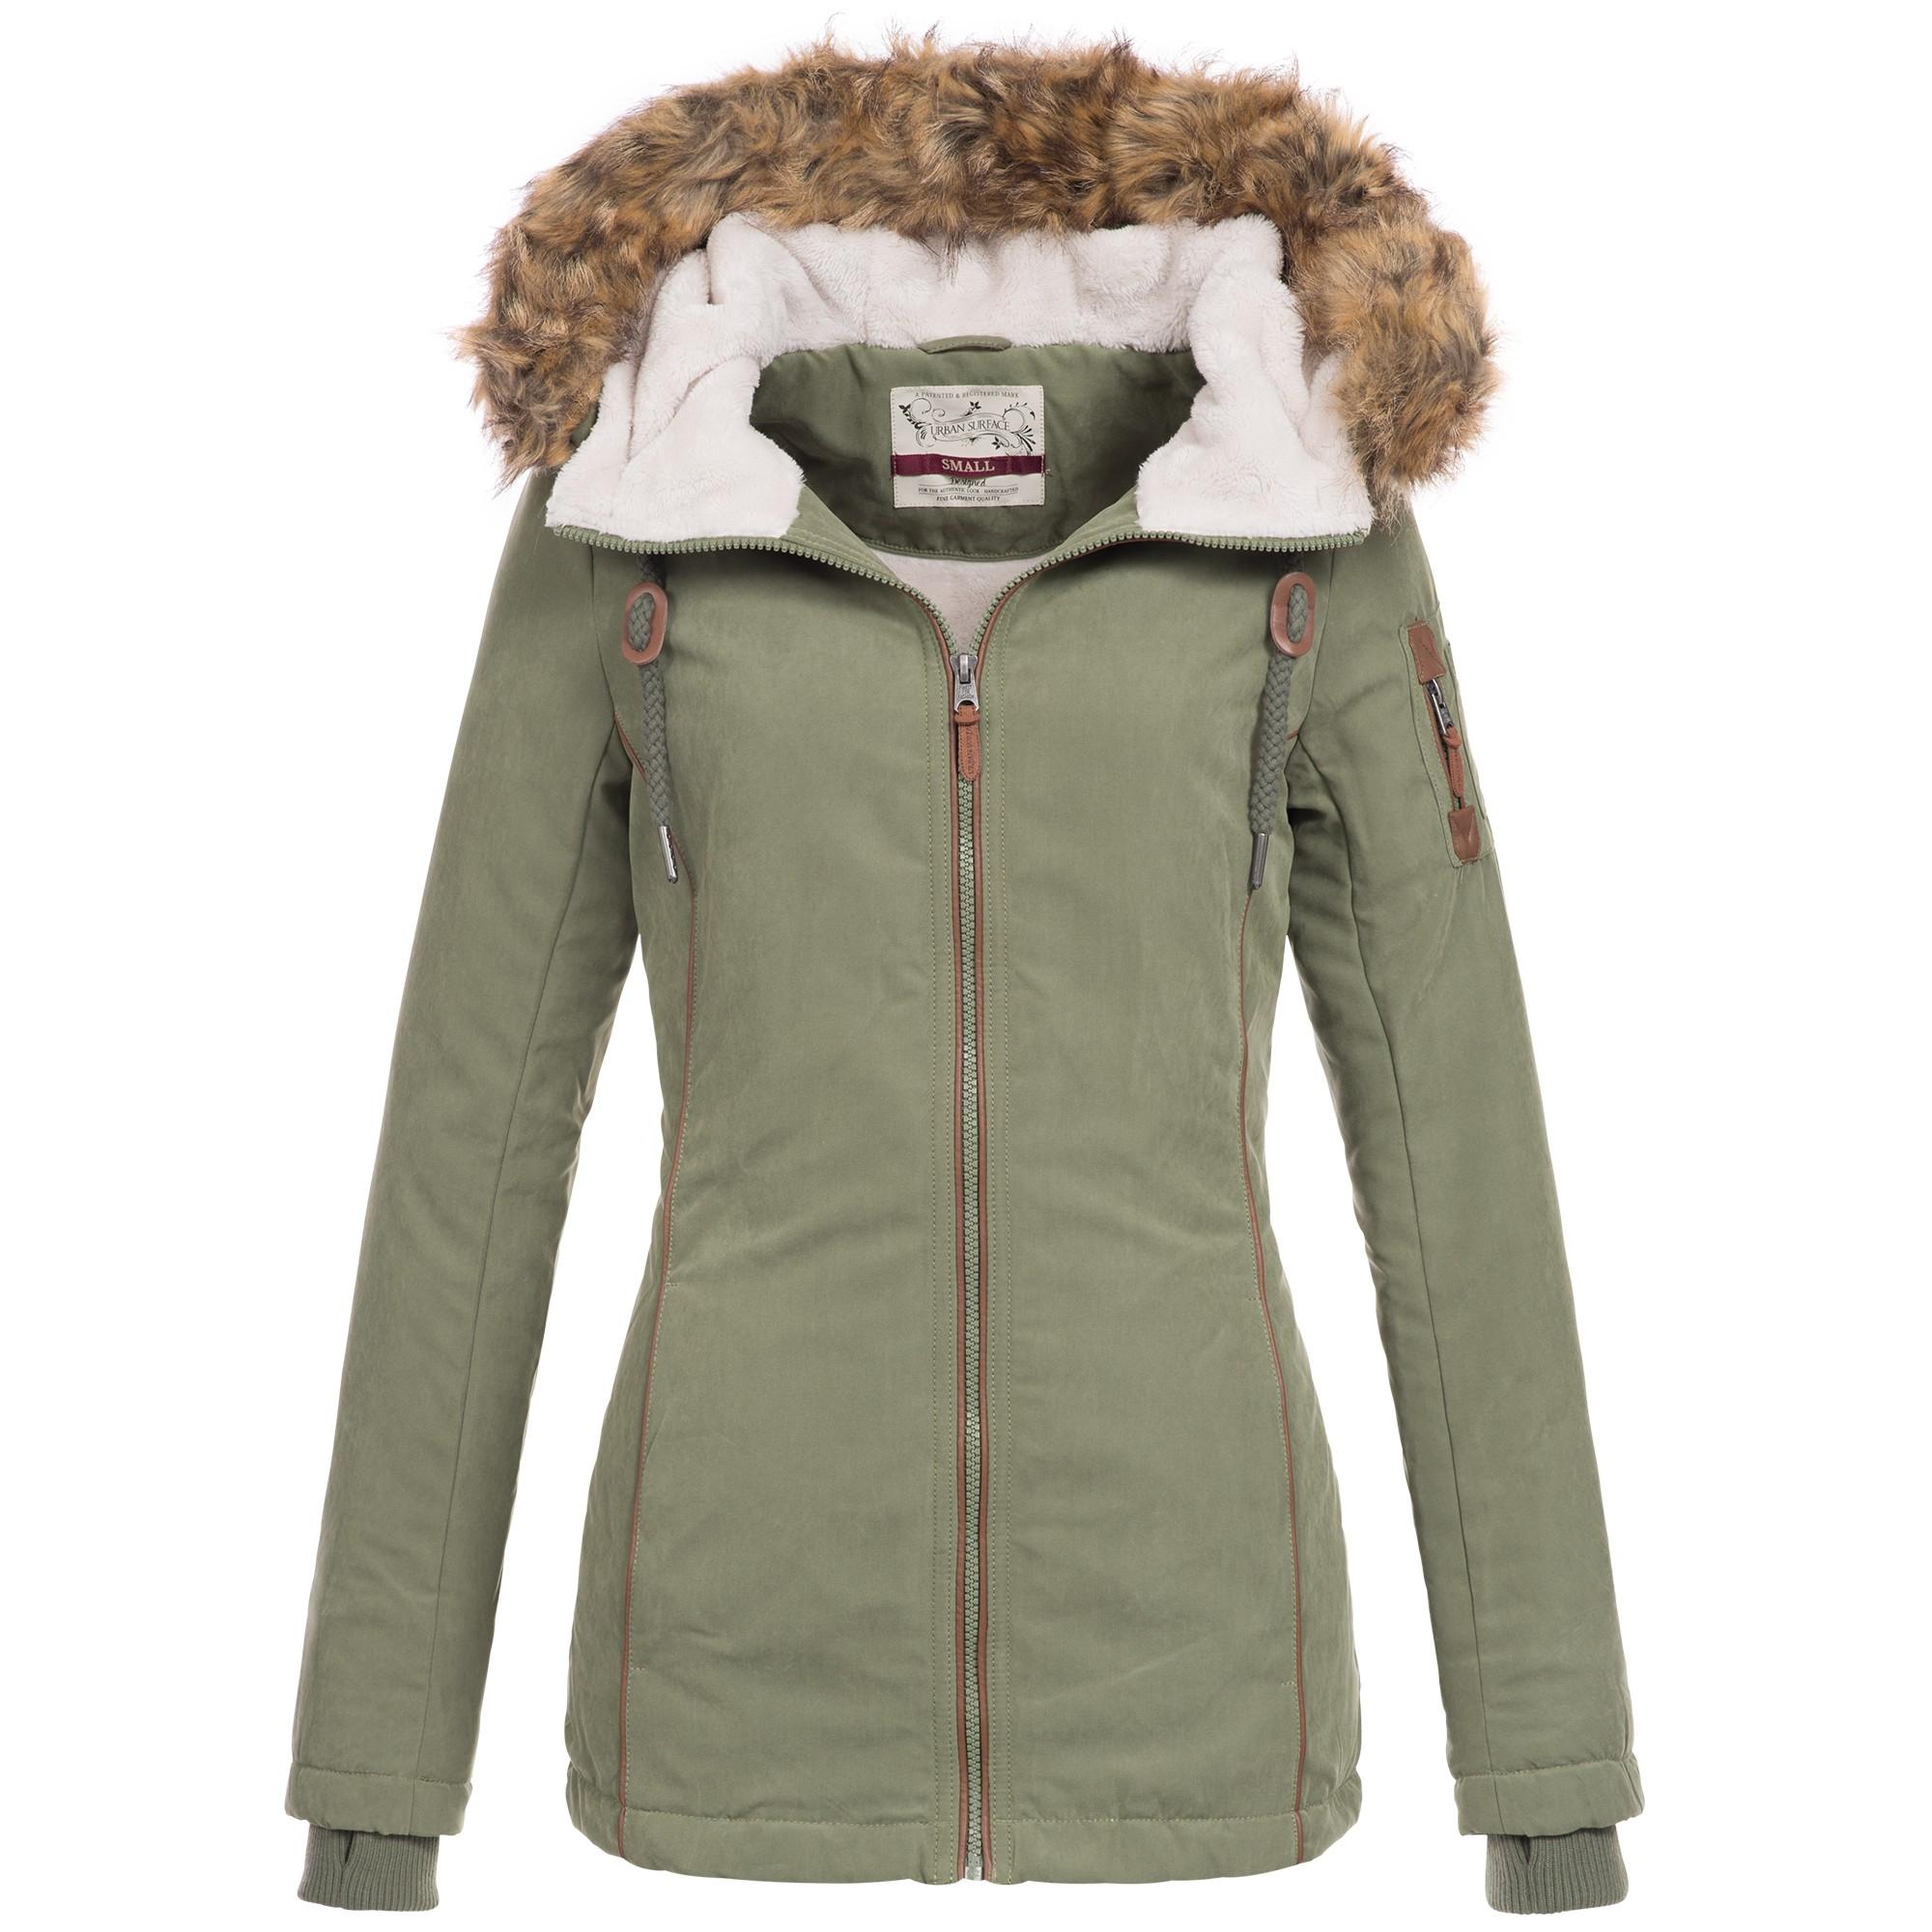 b1f2e14f52a825 Urban Surface Damen Winter Jacke Mantel Parka Teddyfell warm gefüttert  Winterjacke 44392 S-XL